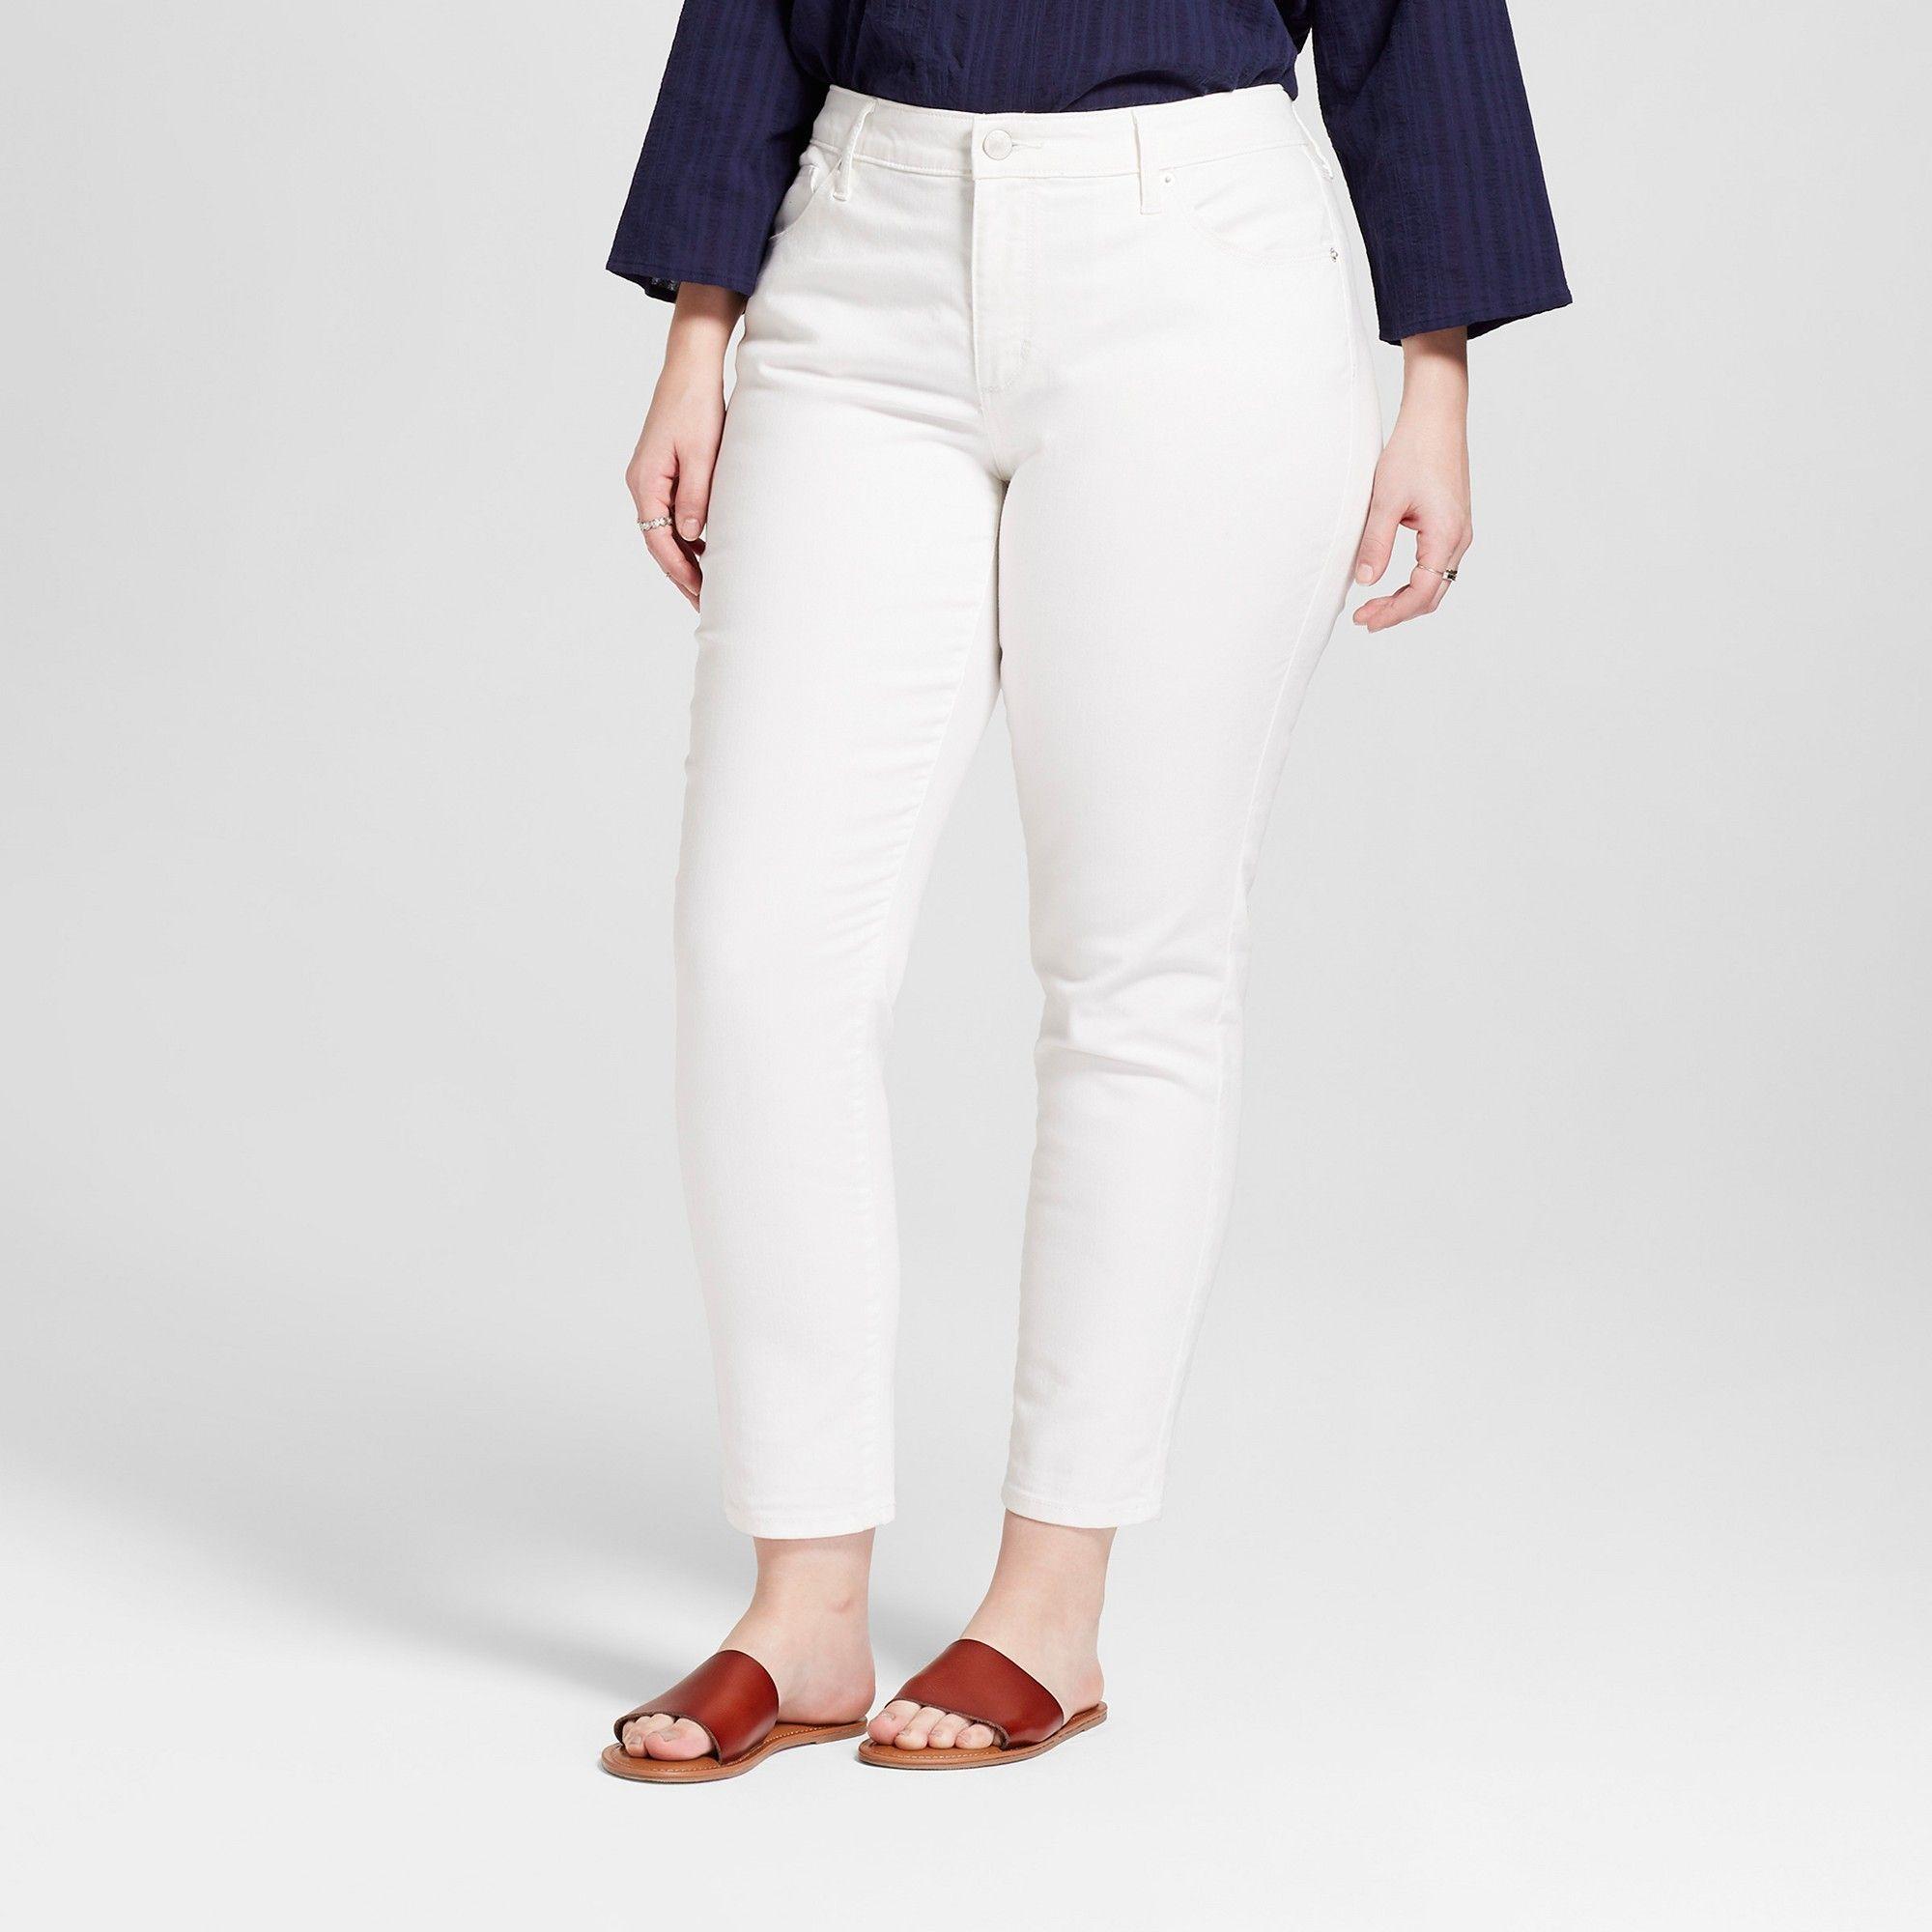 49341cb89172 Women s Plus Size Mid-Rise Skinny Jeans - Universal Thread White 16W ...